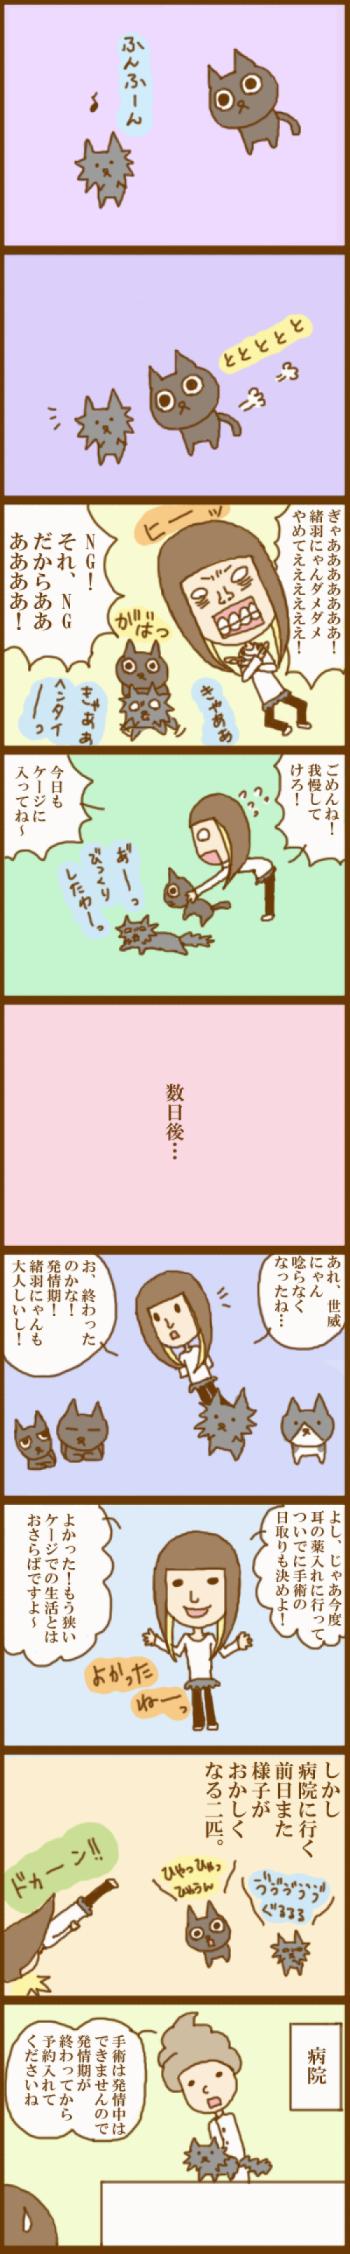 f:id:suzuokayu:20201115190043j:plain